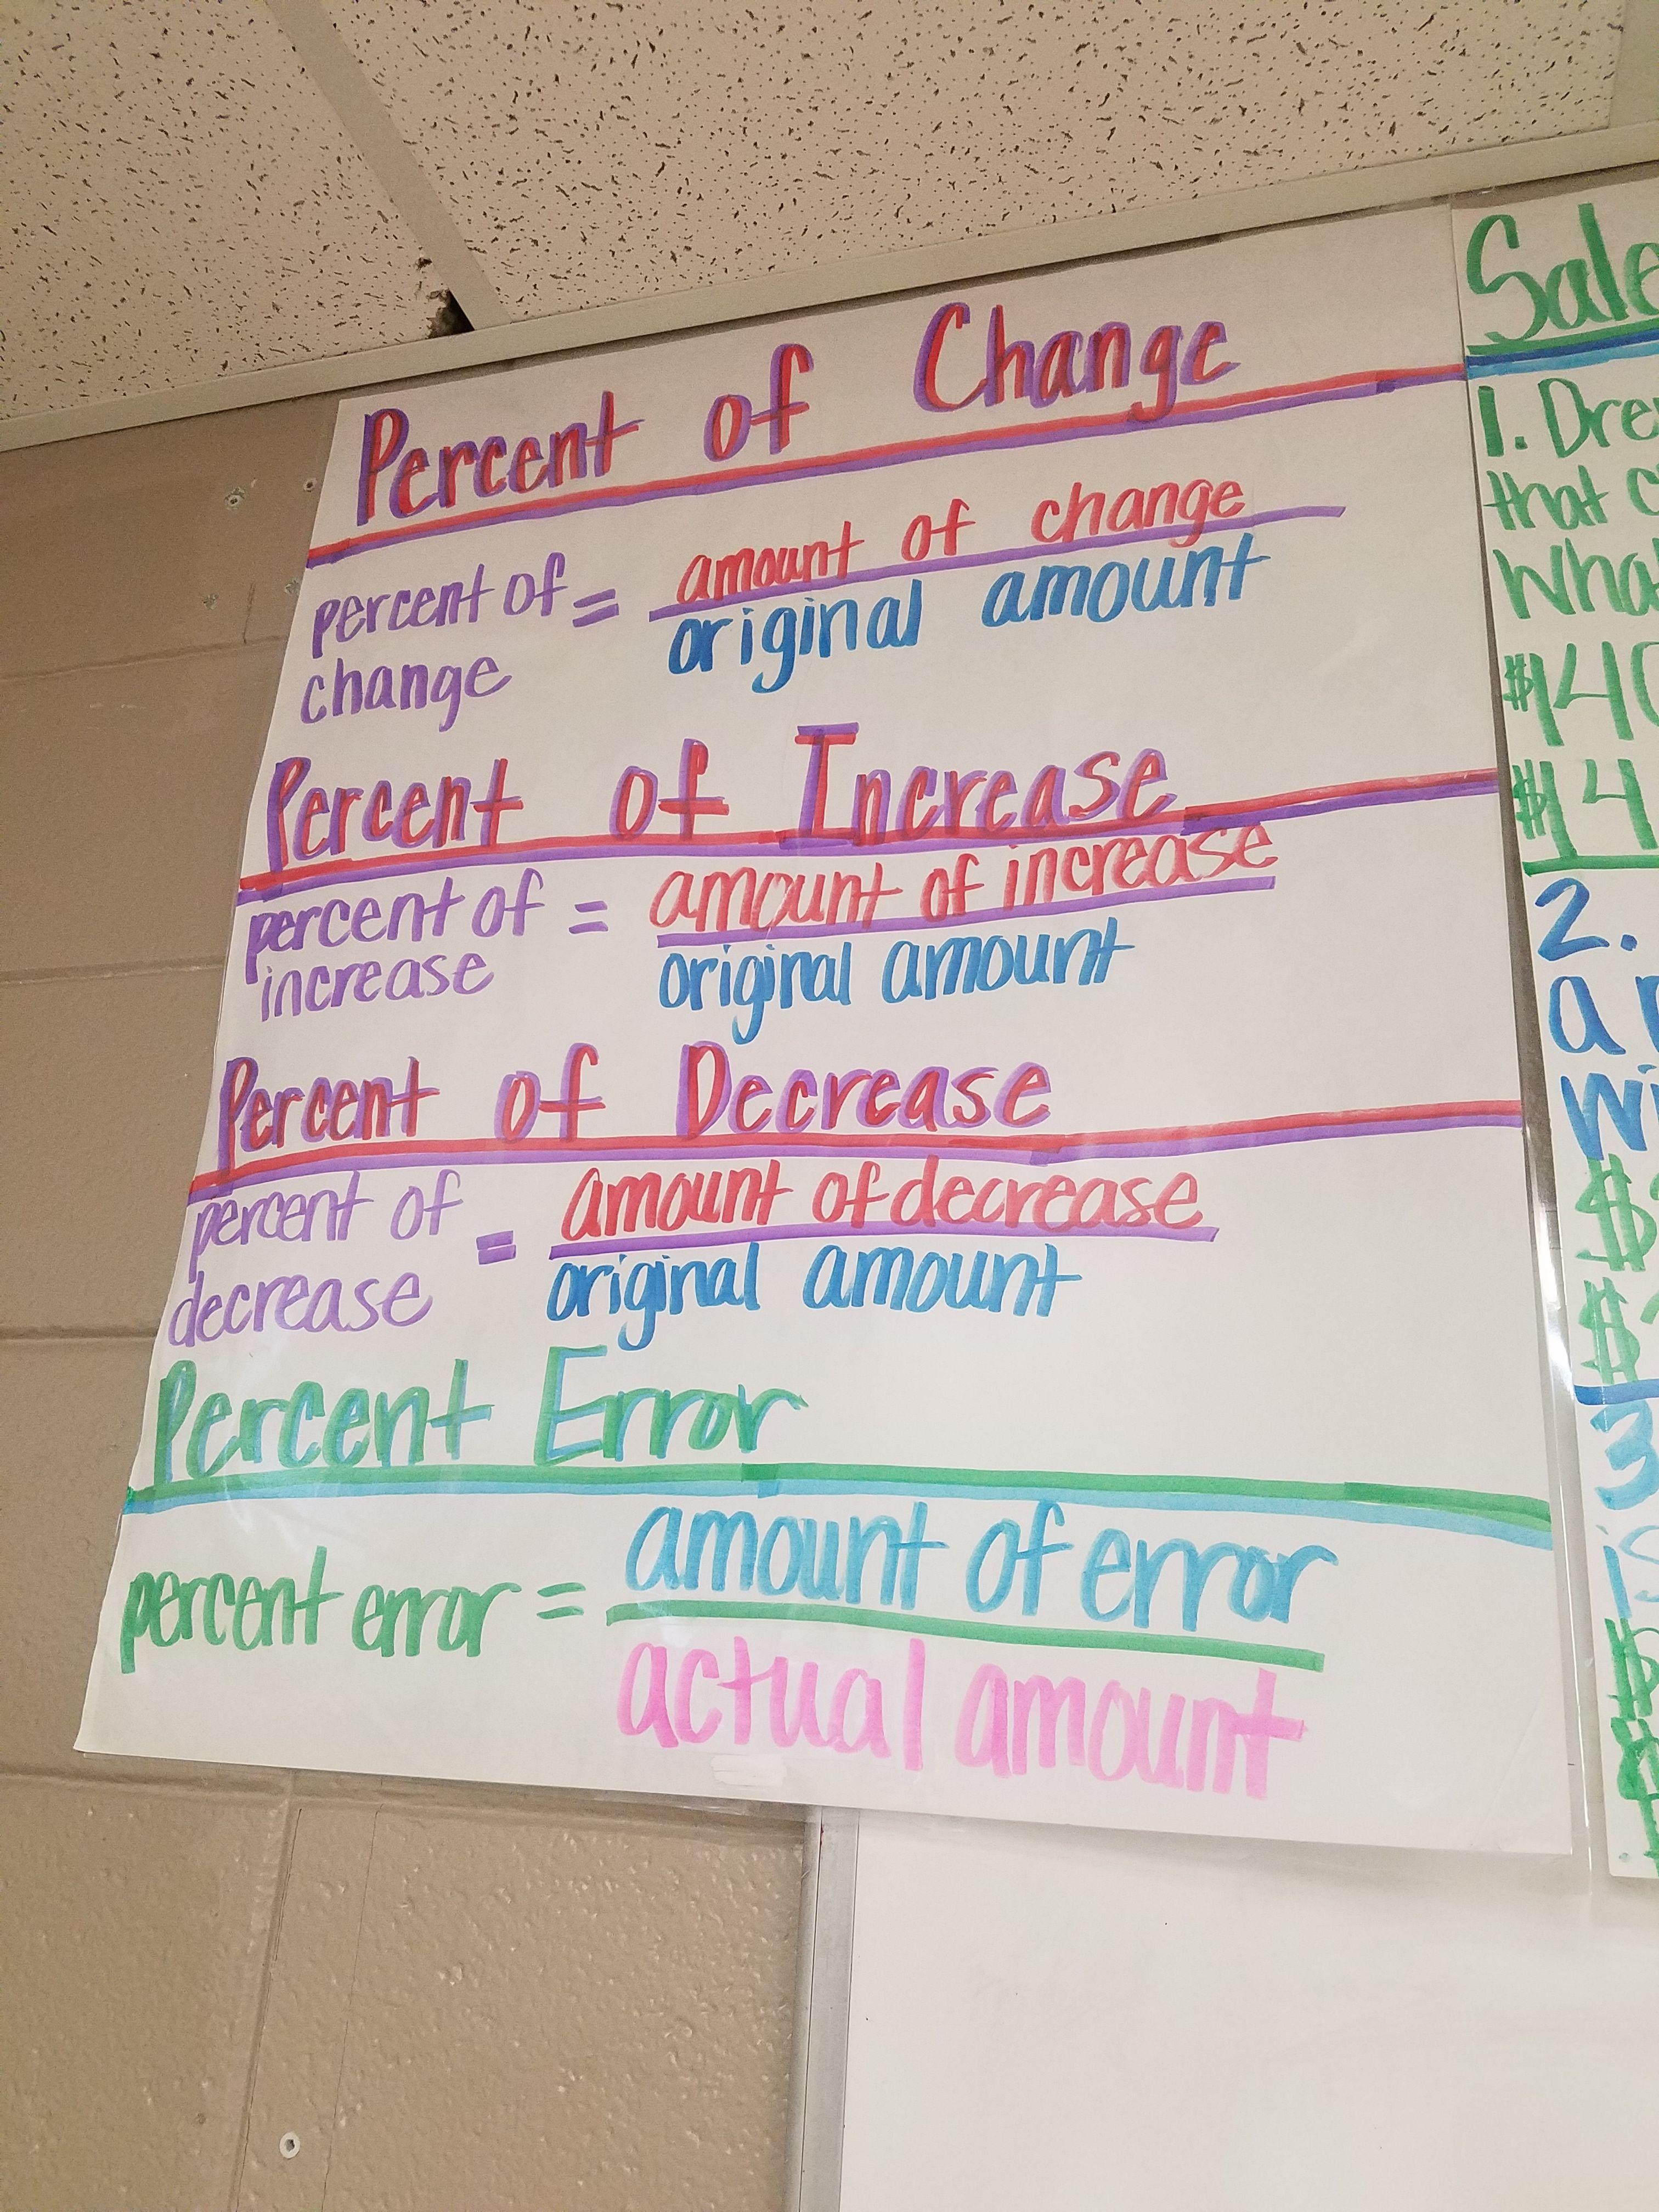 Percent Of Change Increase Decrease Error